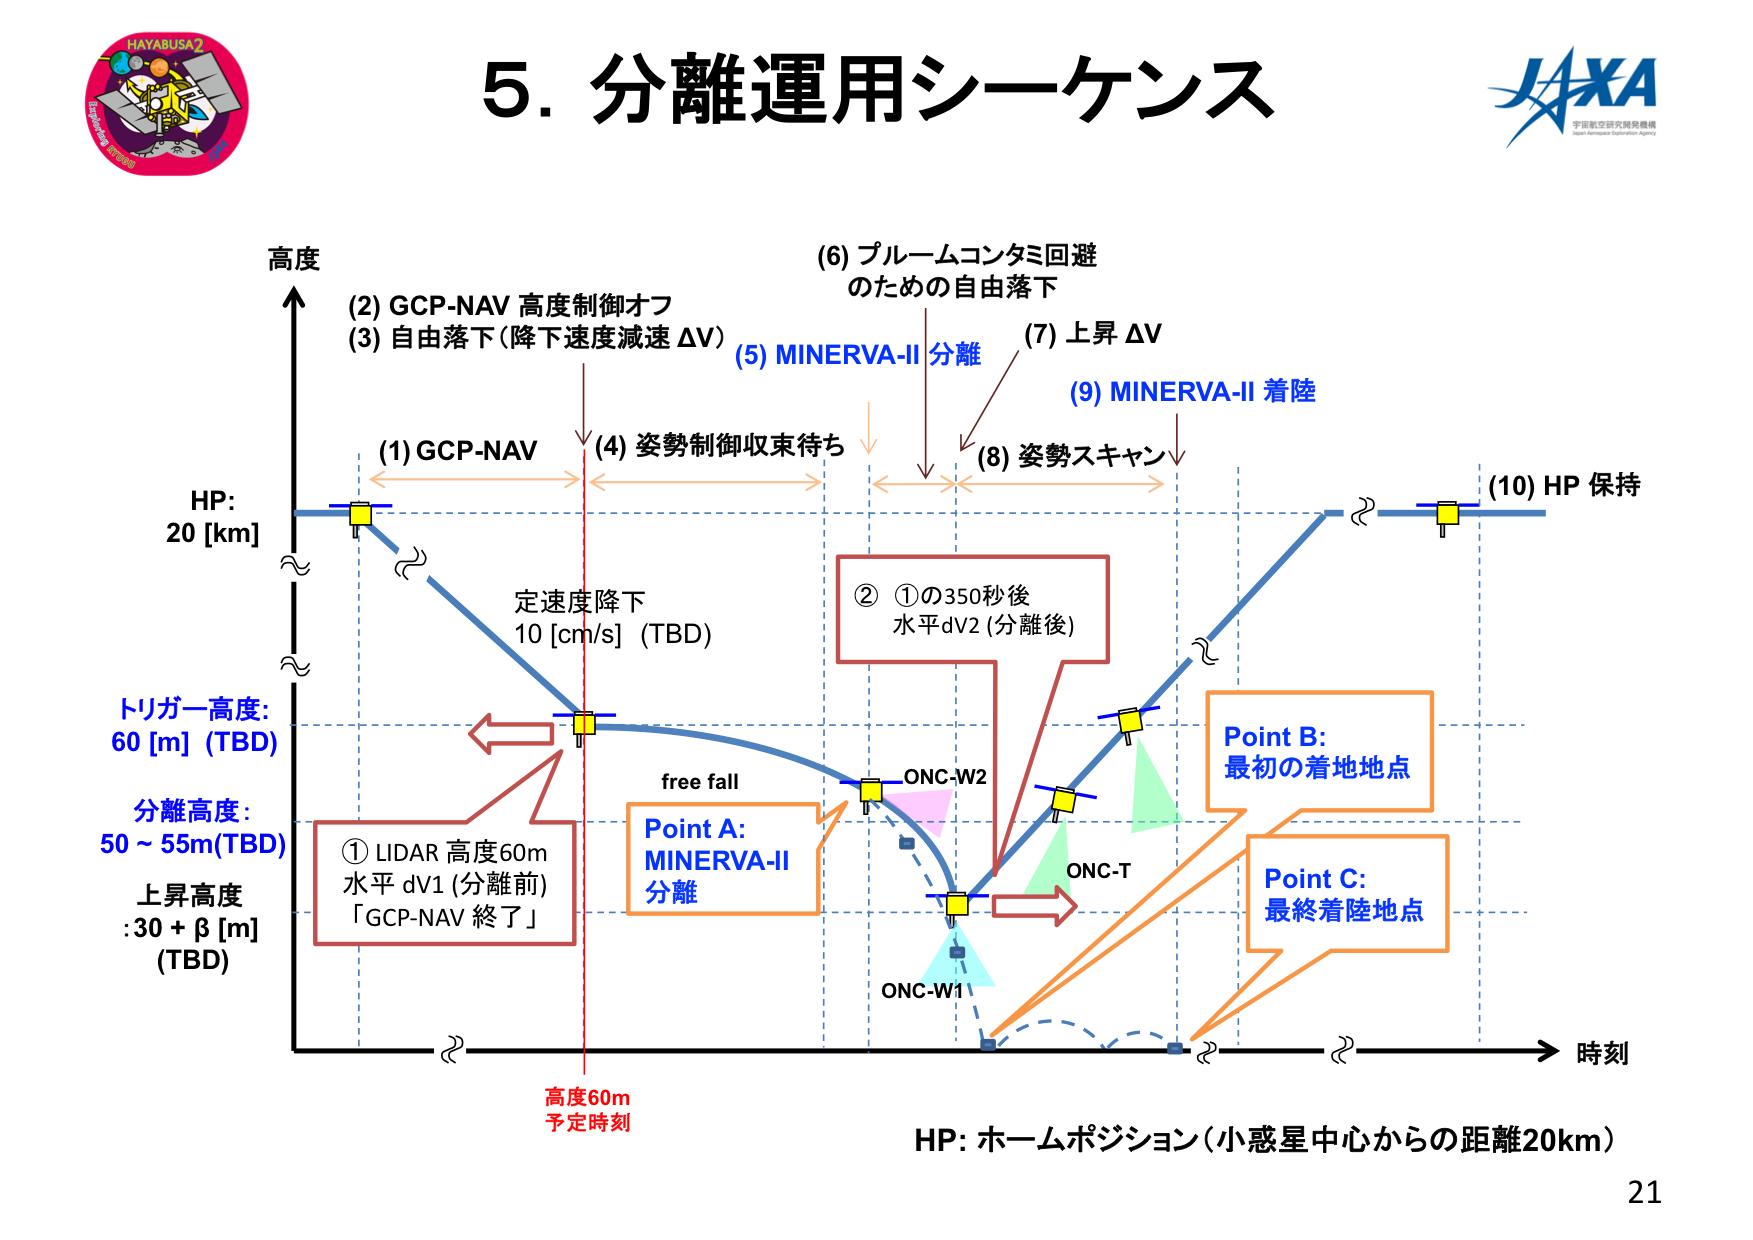 f:id:Imamura:20180905231953p:plain